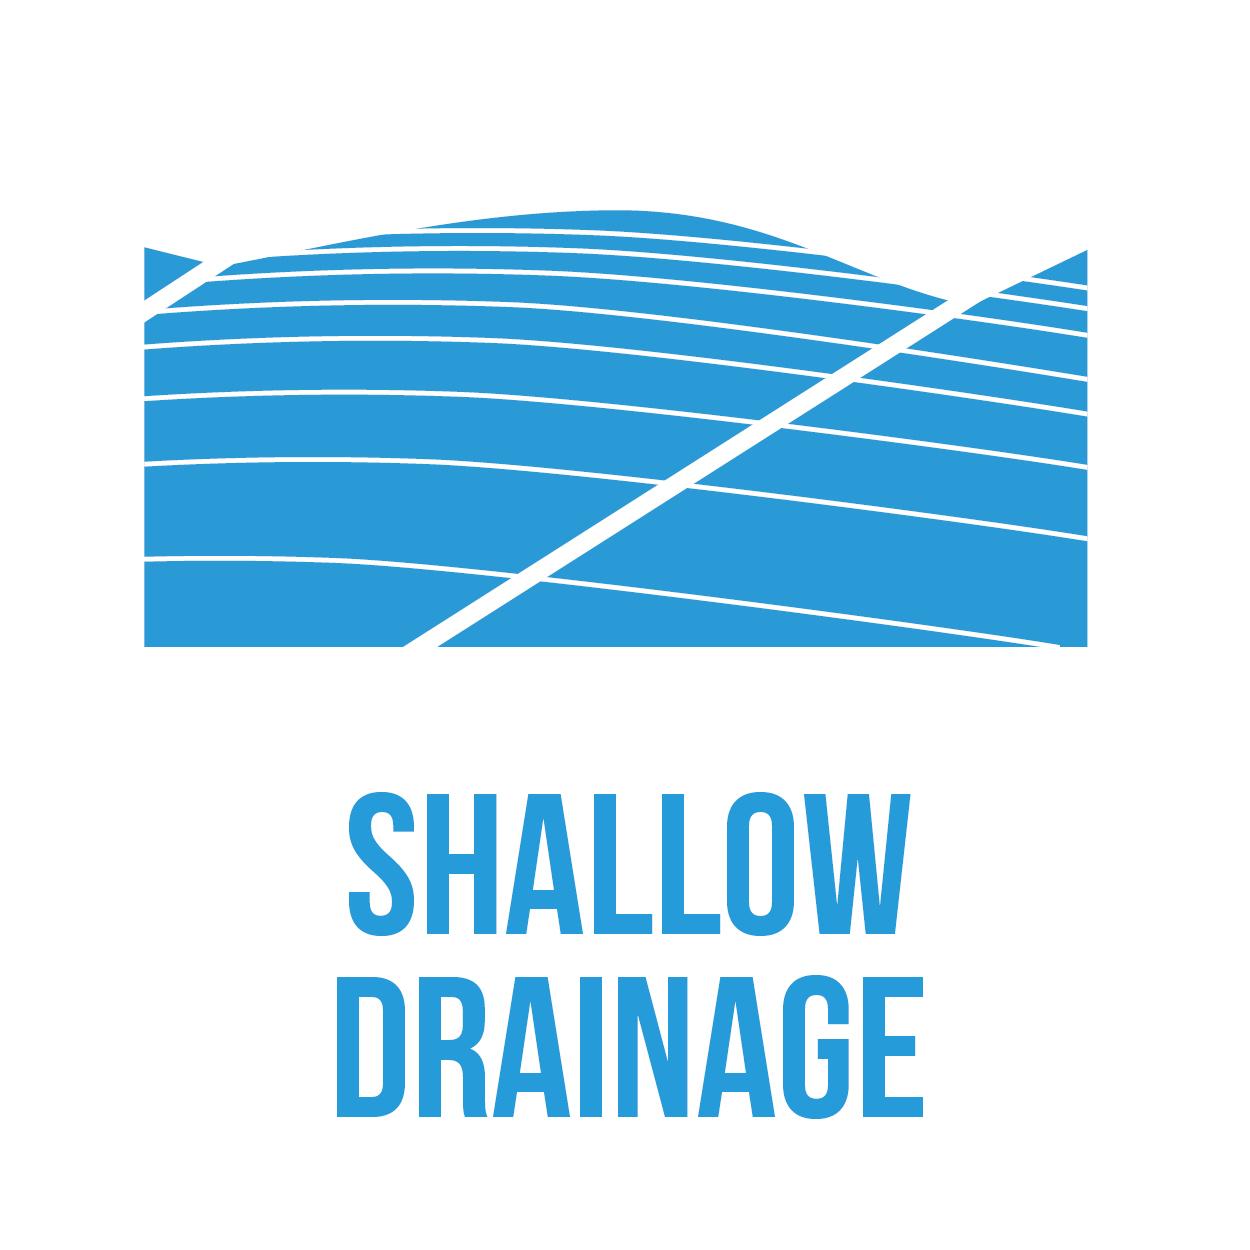 icon-shallowdrainage-square.jpg